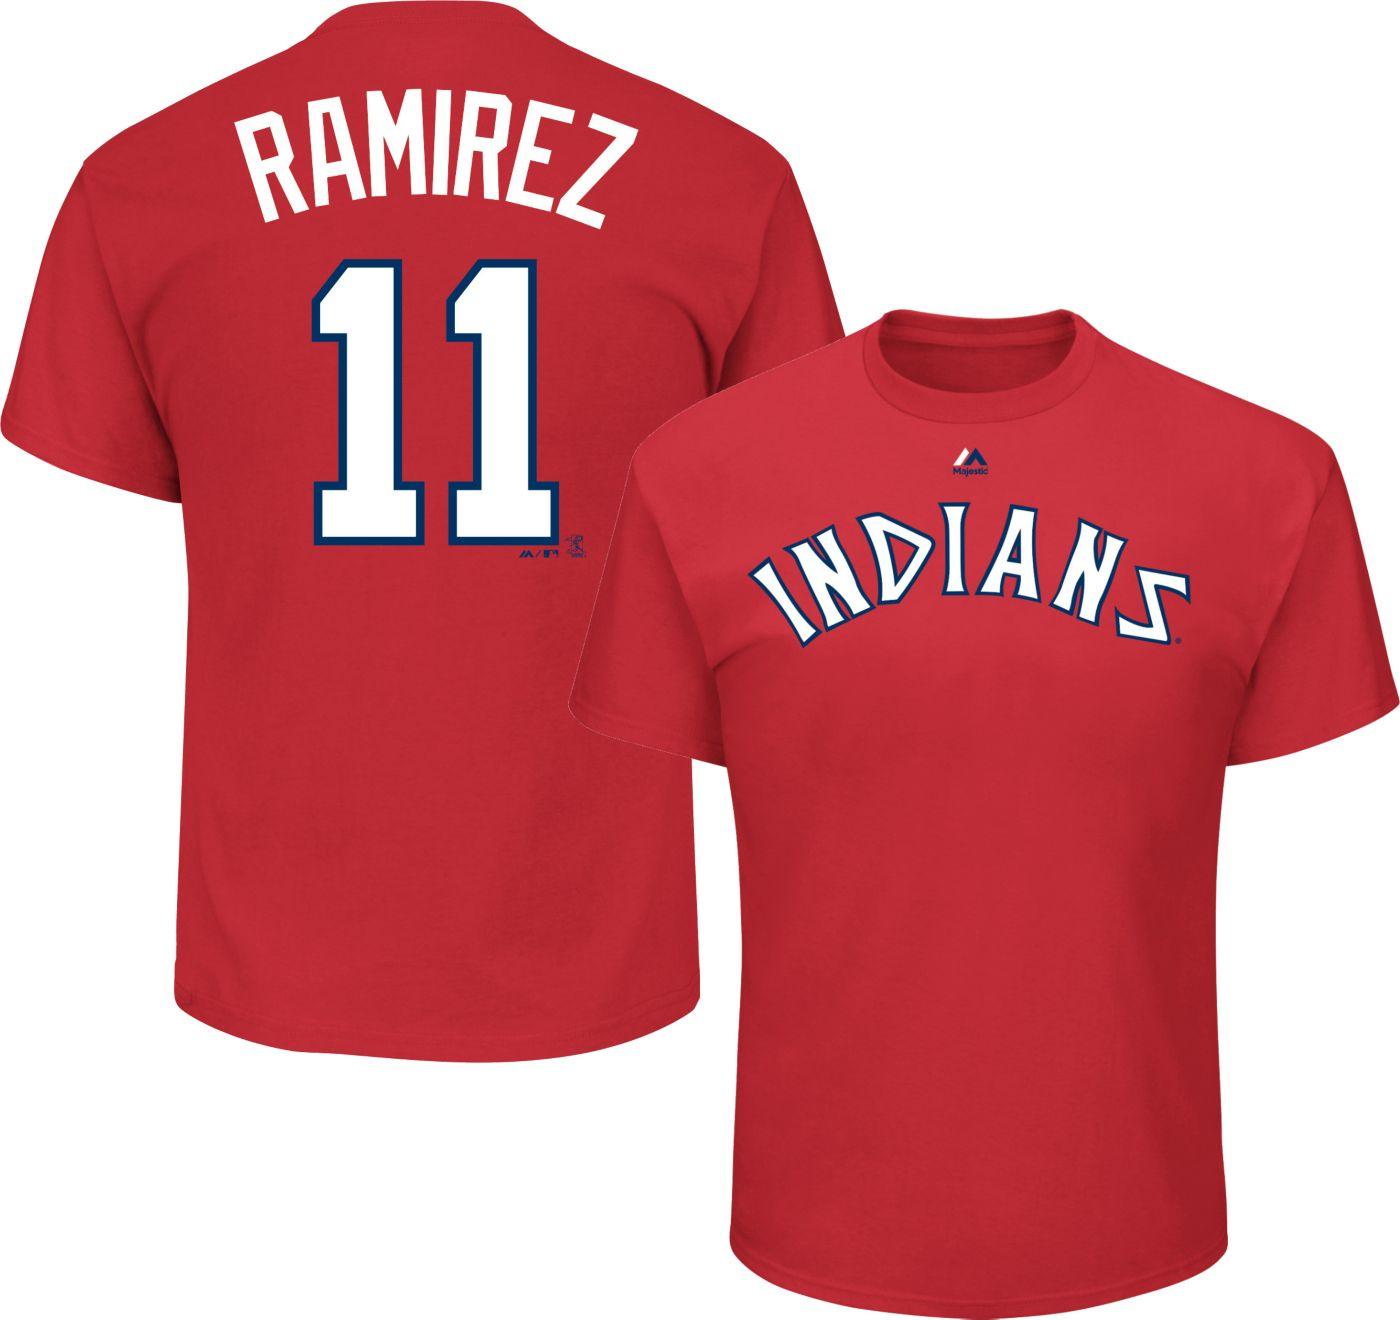 Majestic Men's Cleveland Indians Jose Ramirez #11 Cooperstown Red T-Shirt